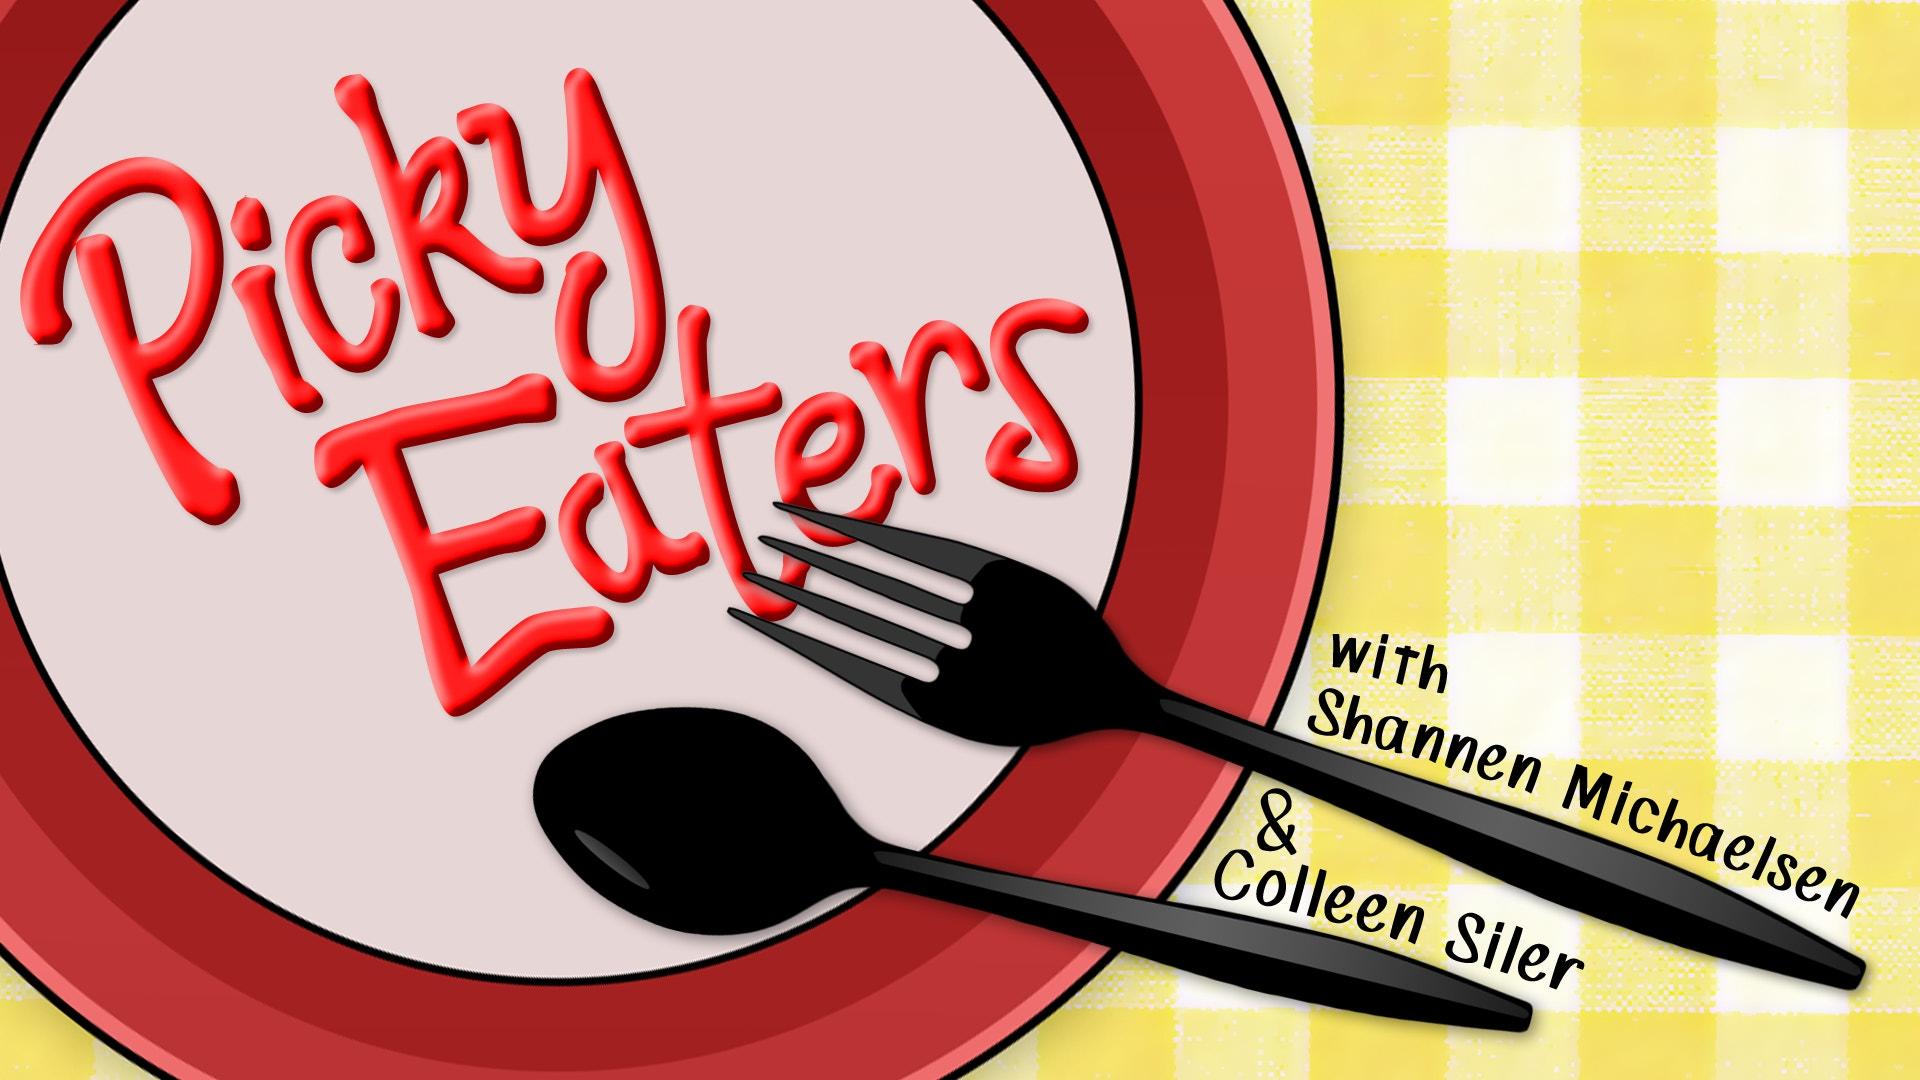 picky eaters logo